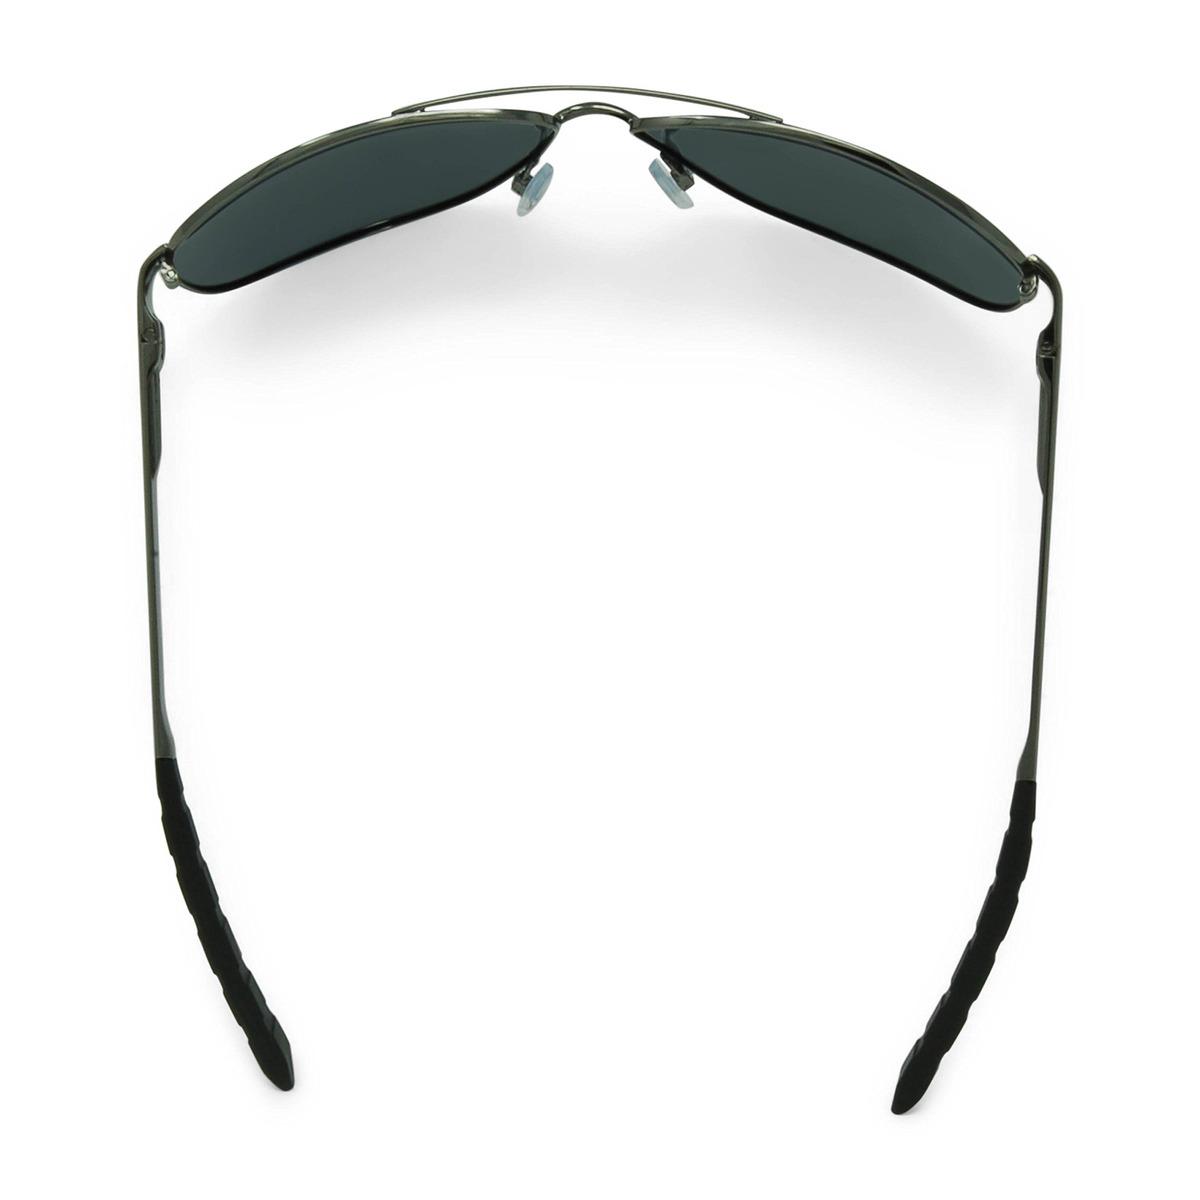 7228c07513 flying fisherman 7816ca highlander polarized sunglasses. Cargando zoom.